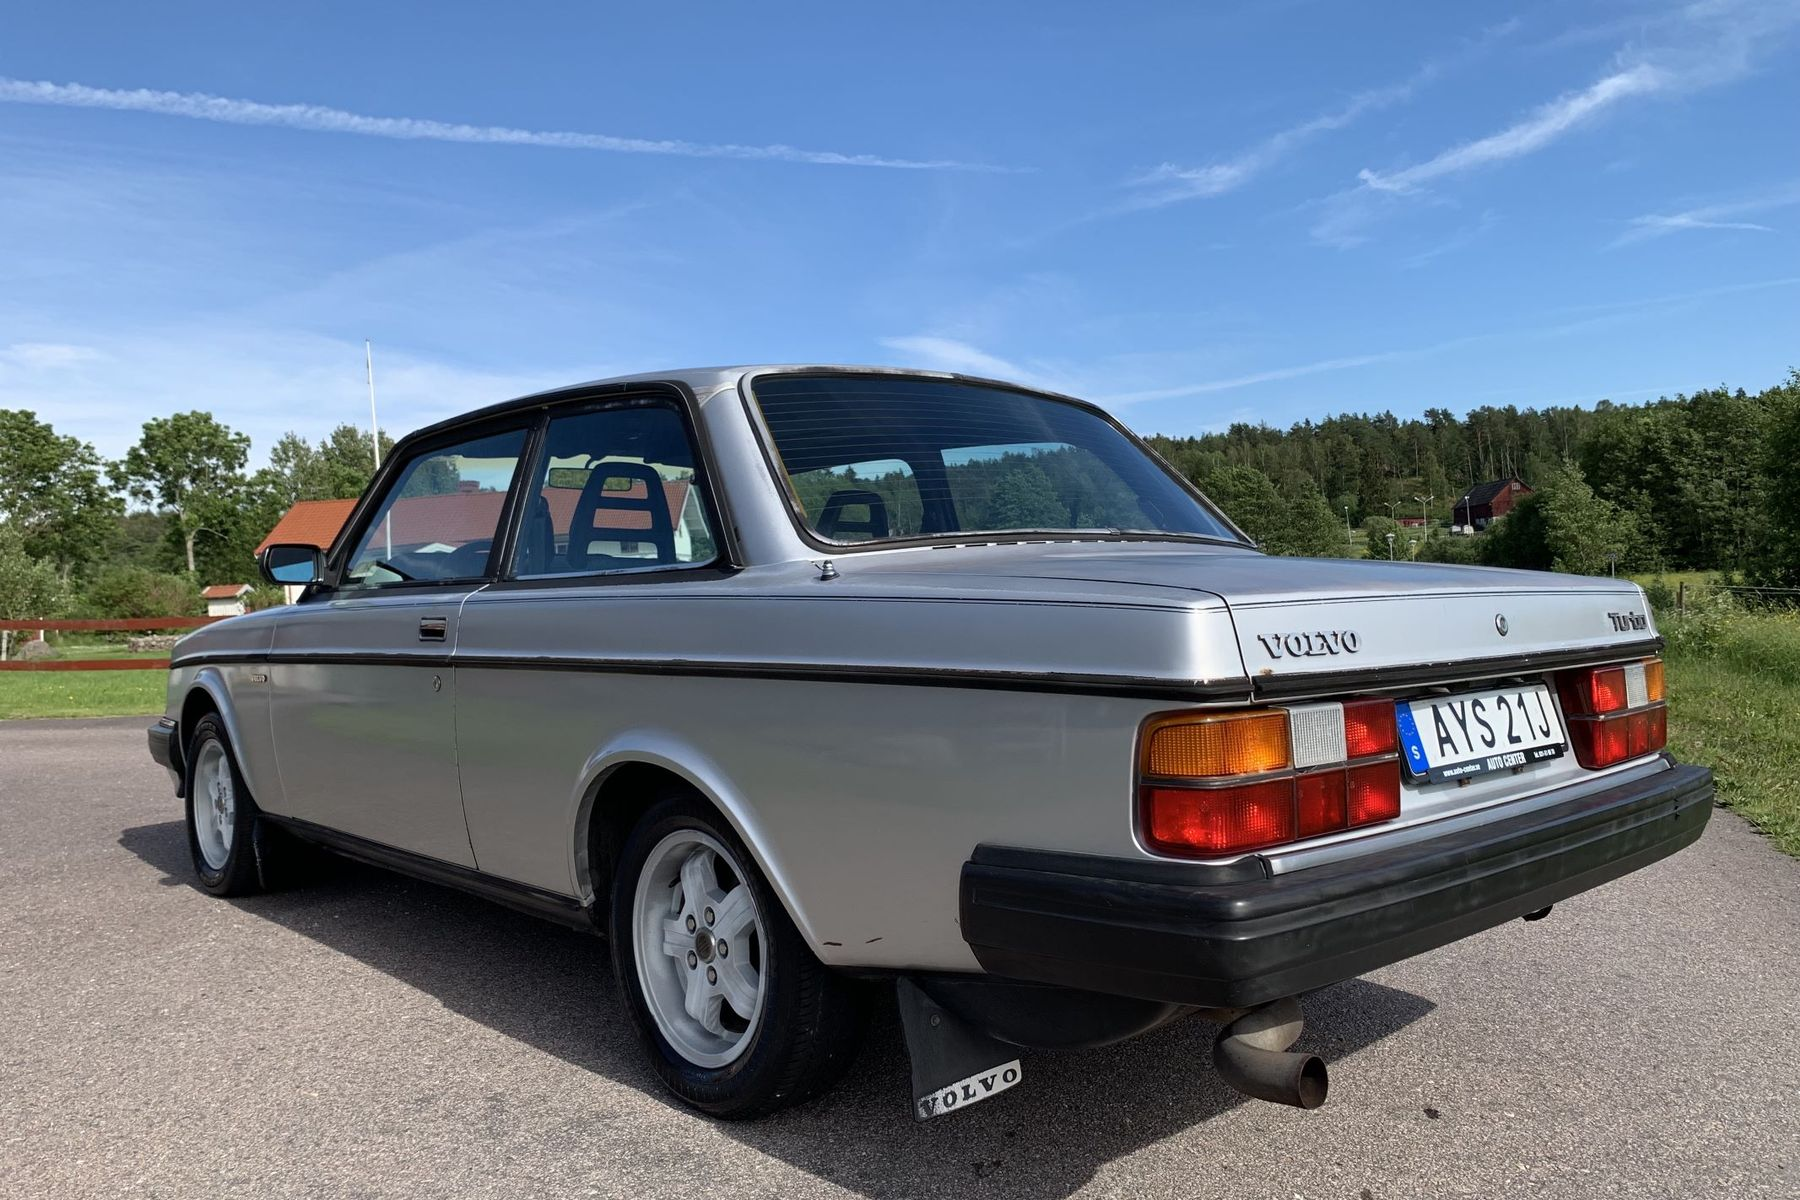 Volvo 242 Turbo B21 Et 1983 On Bilweb Auctions